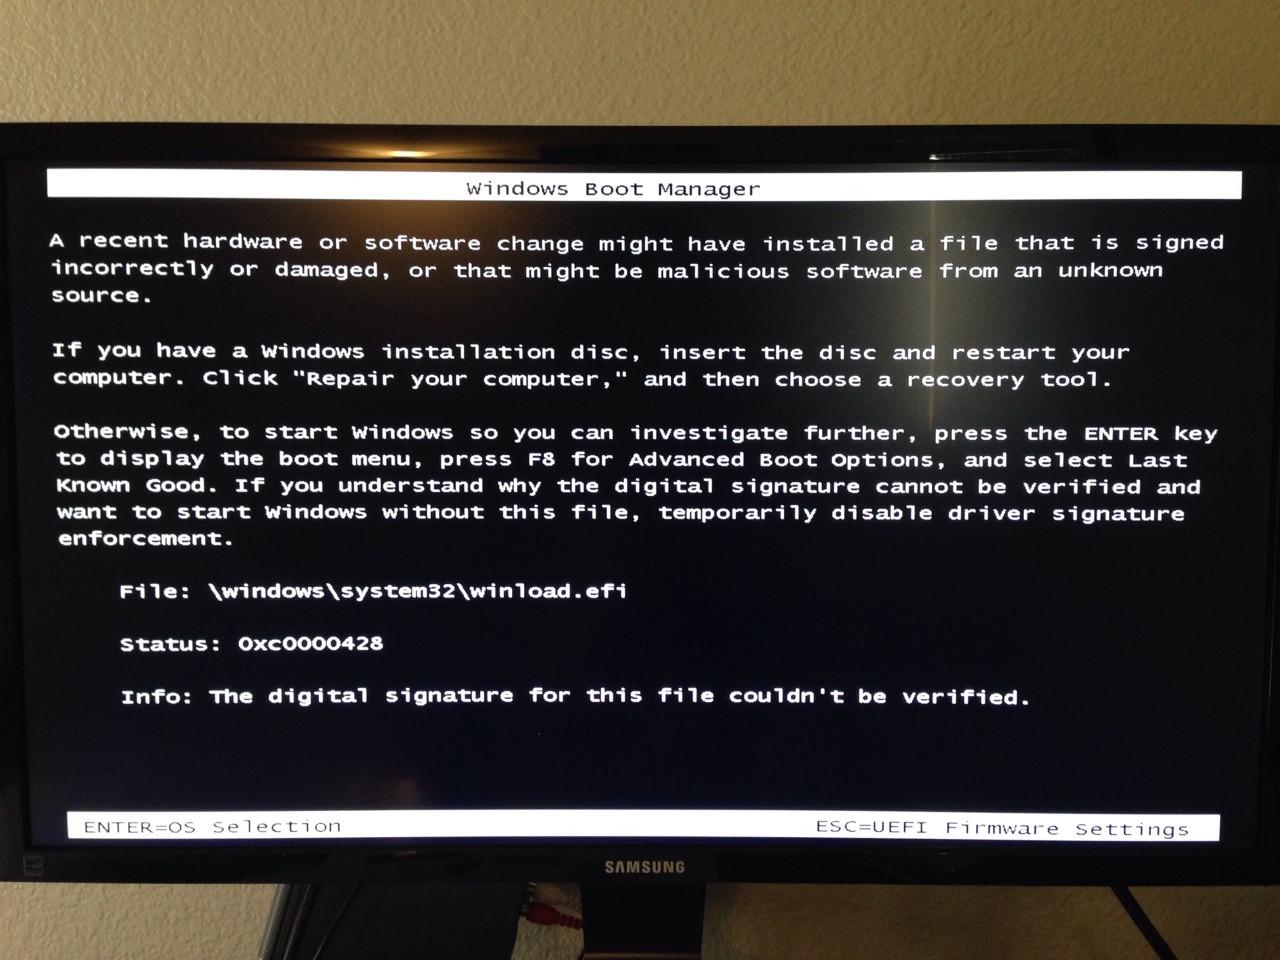 winload.efi corrupted after windows 10 installation - Super User